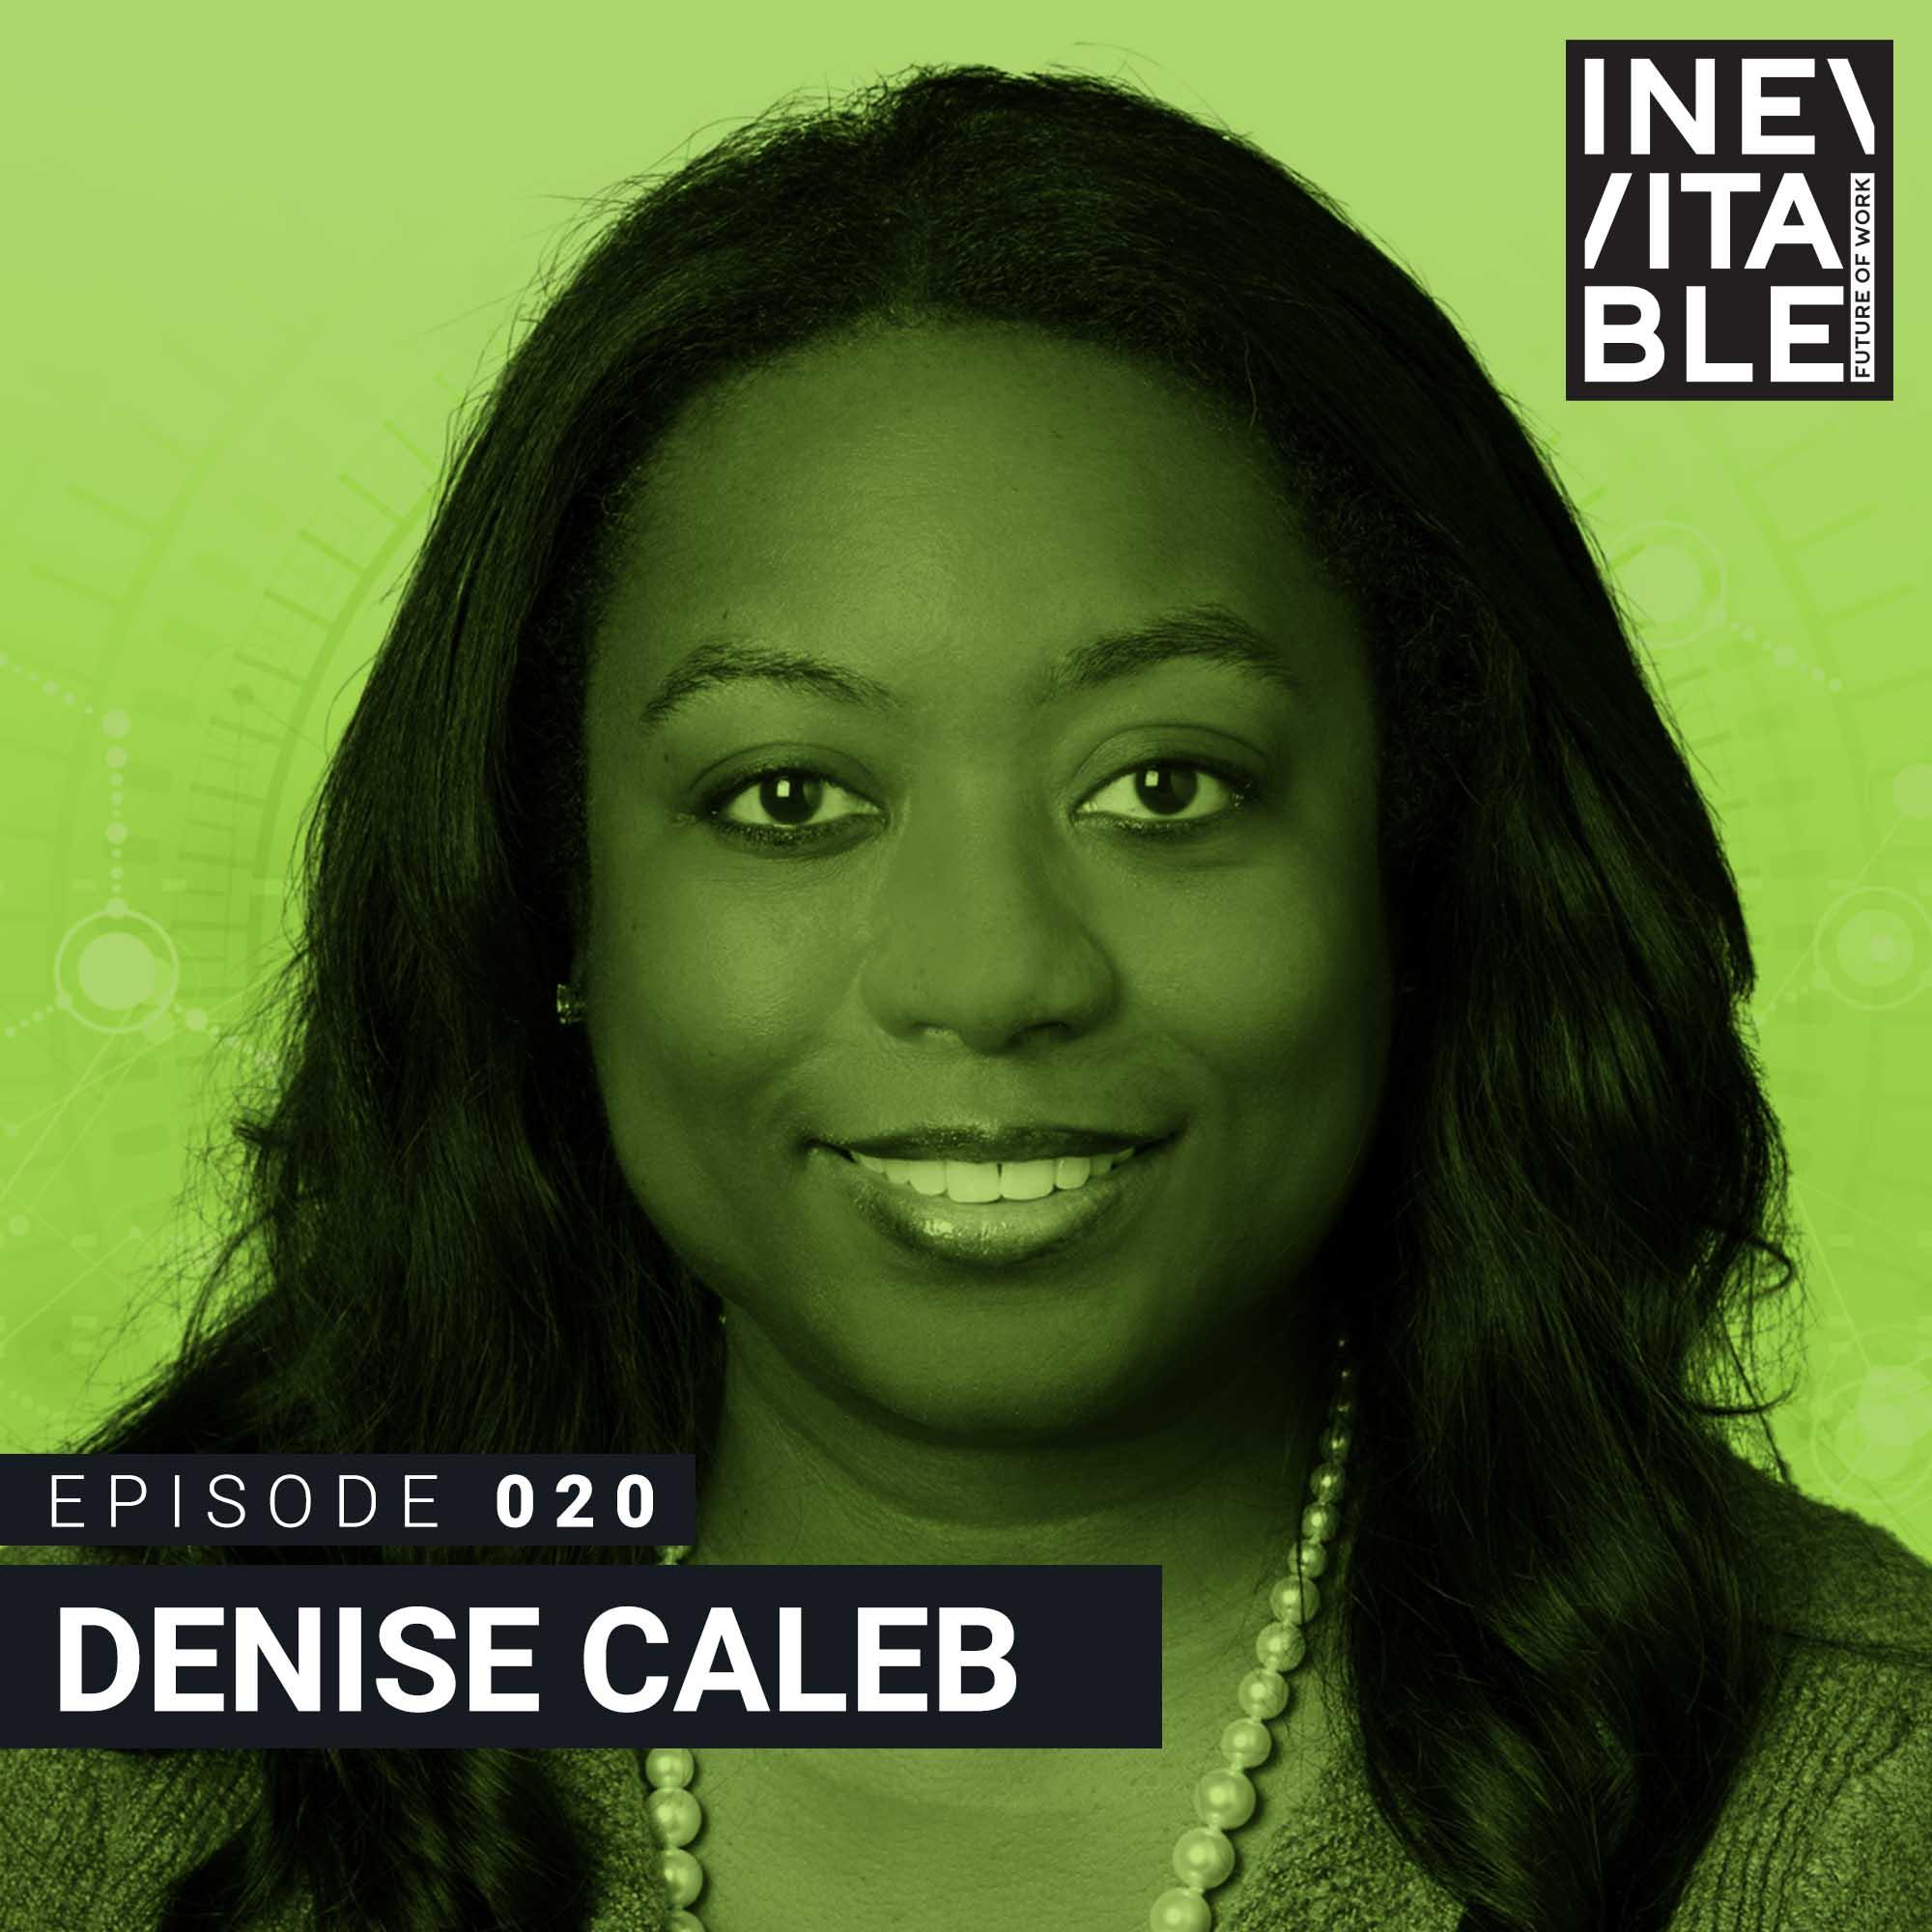 Denise Caleb